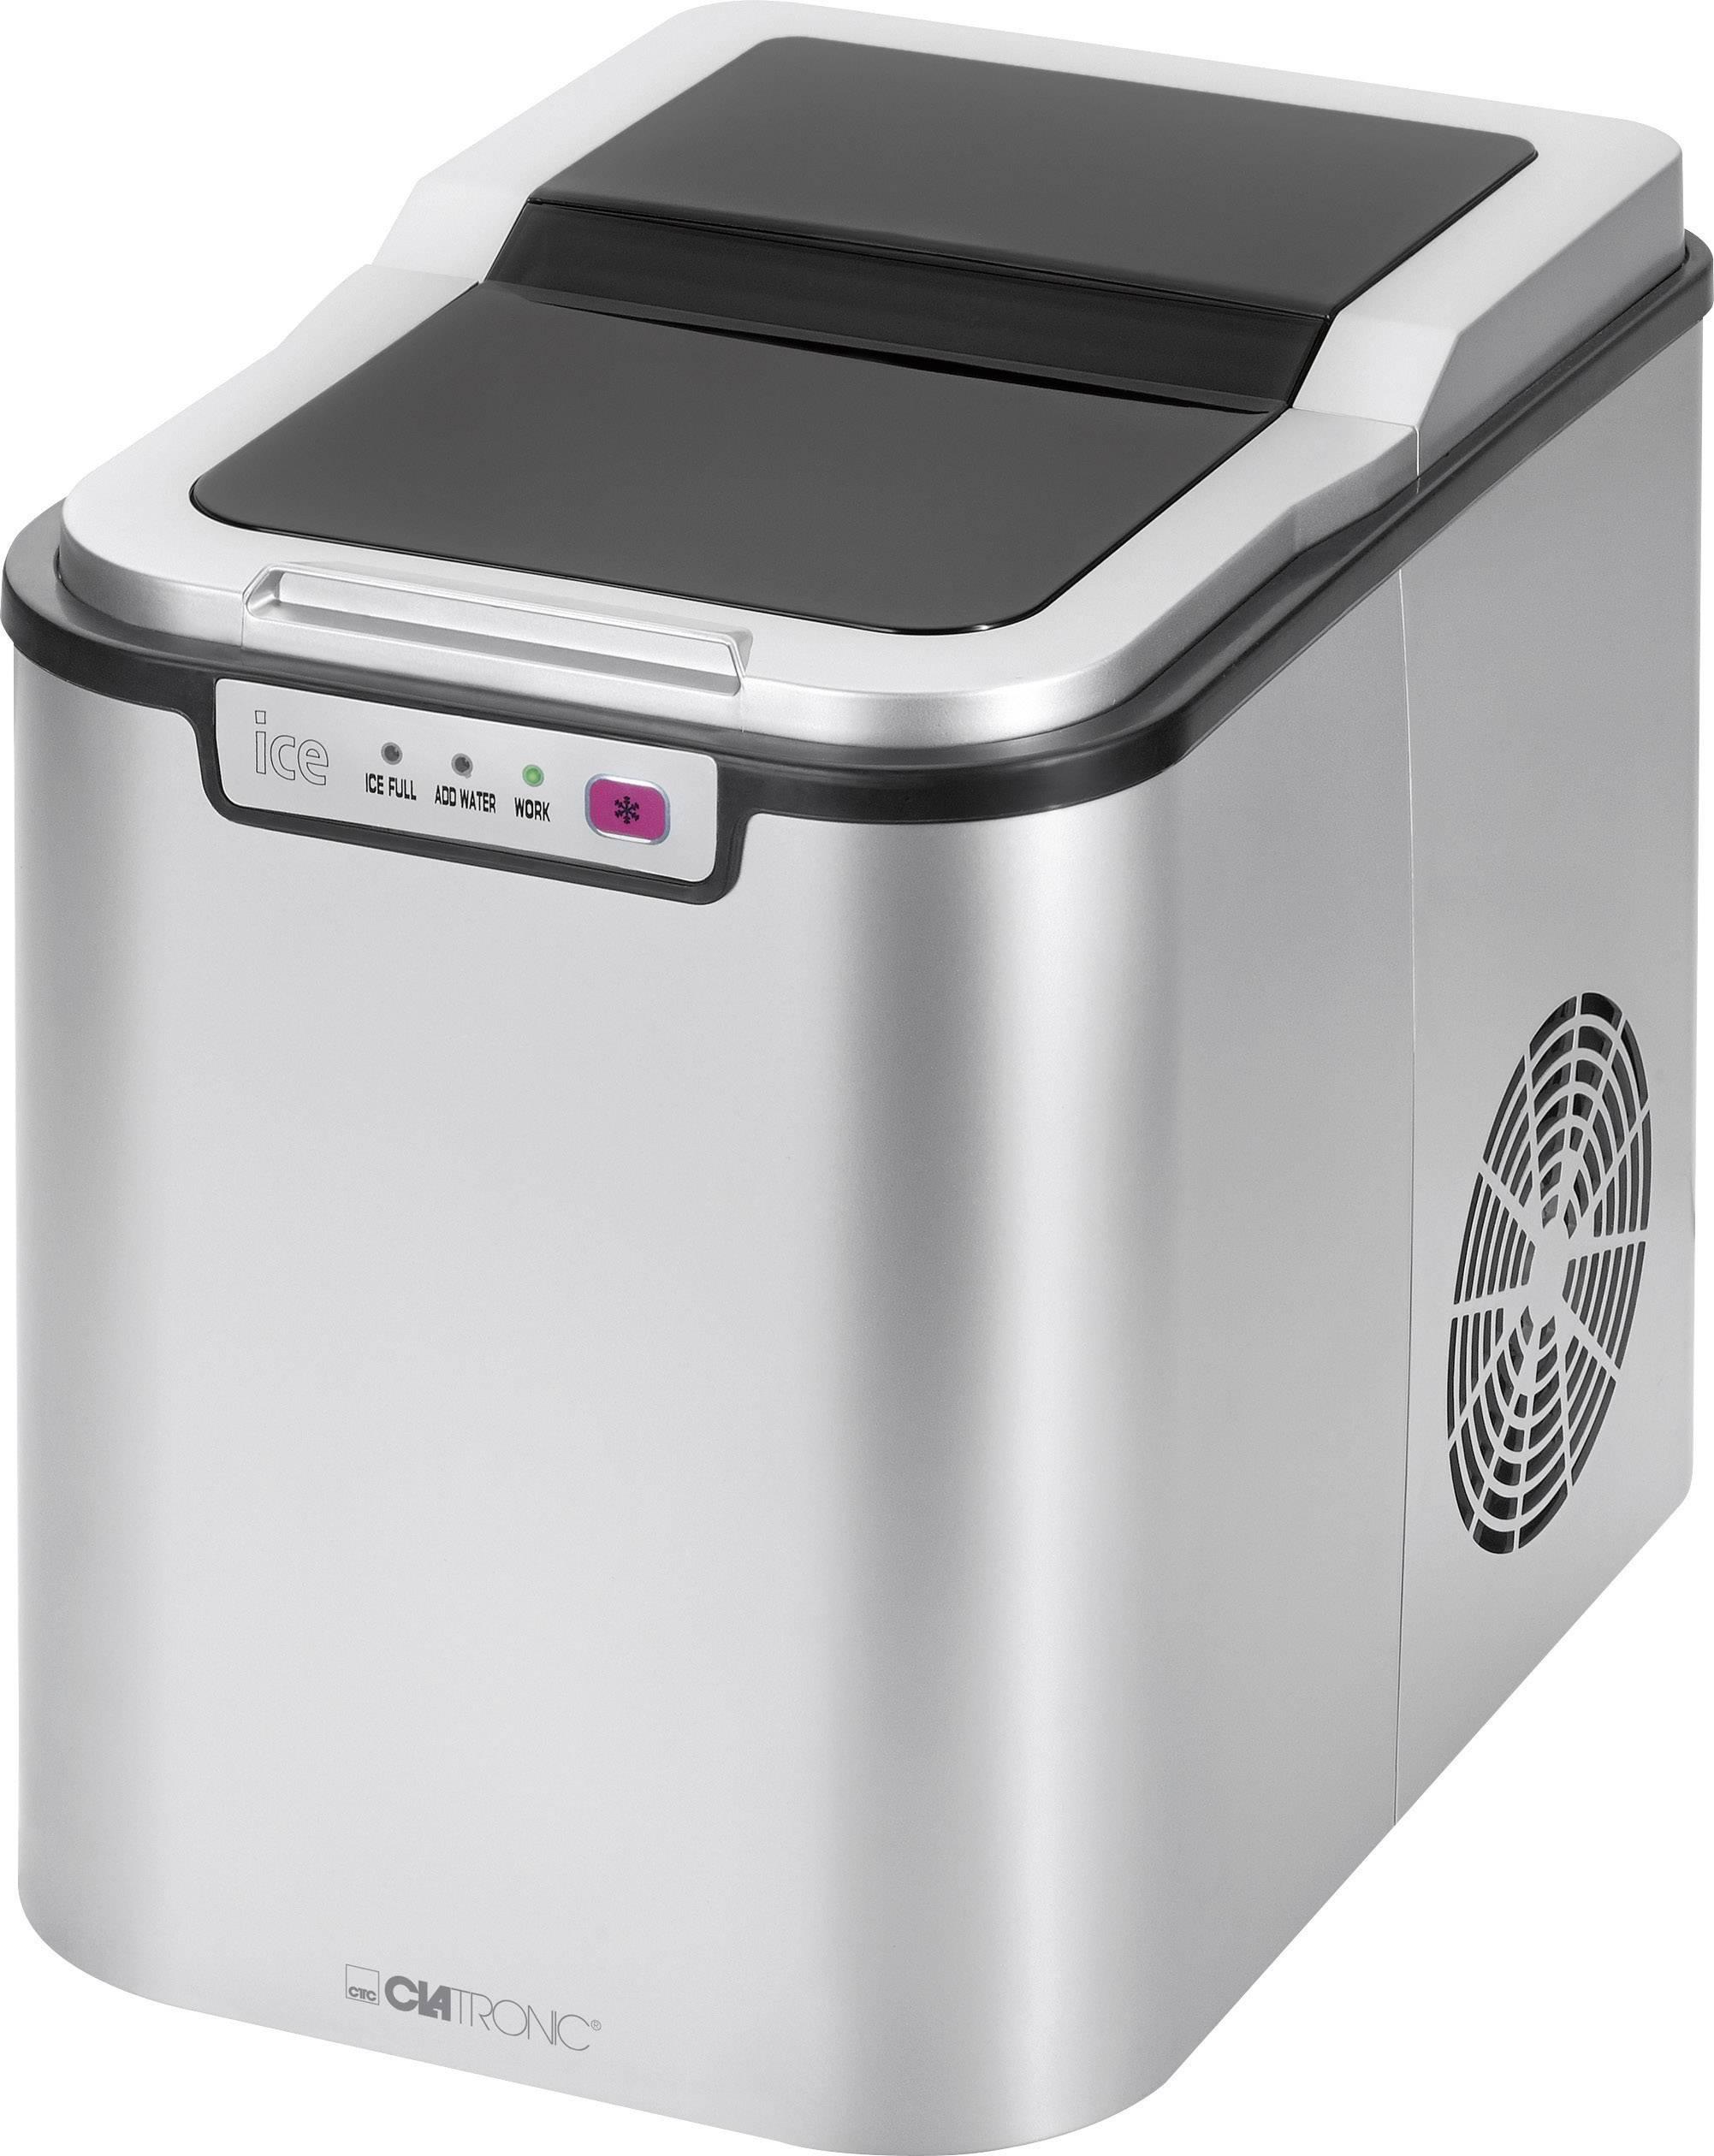 Výrobník ledu Clatronic EWB 3526, 2.2 l